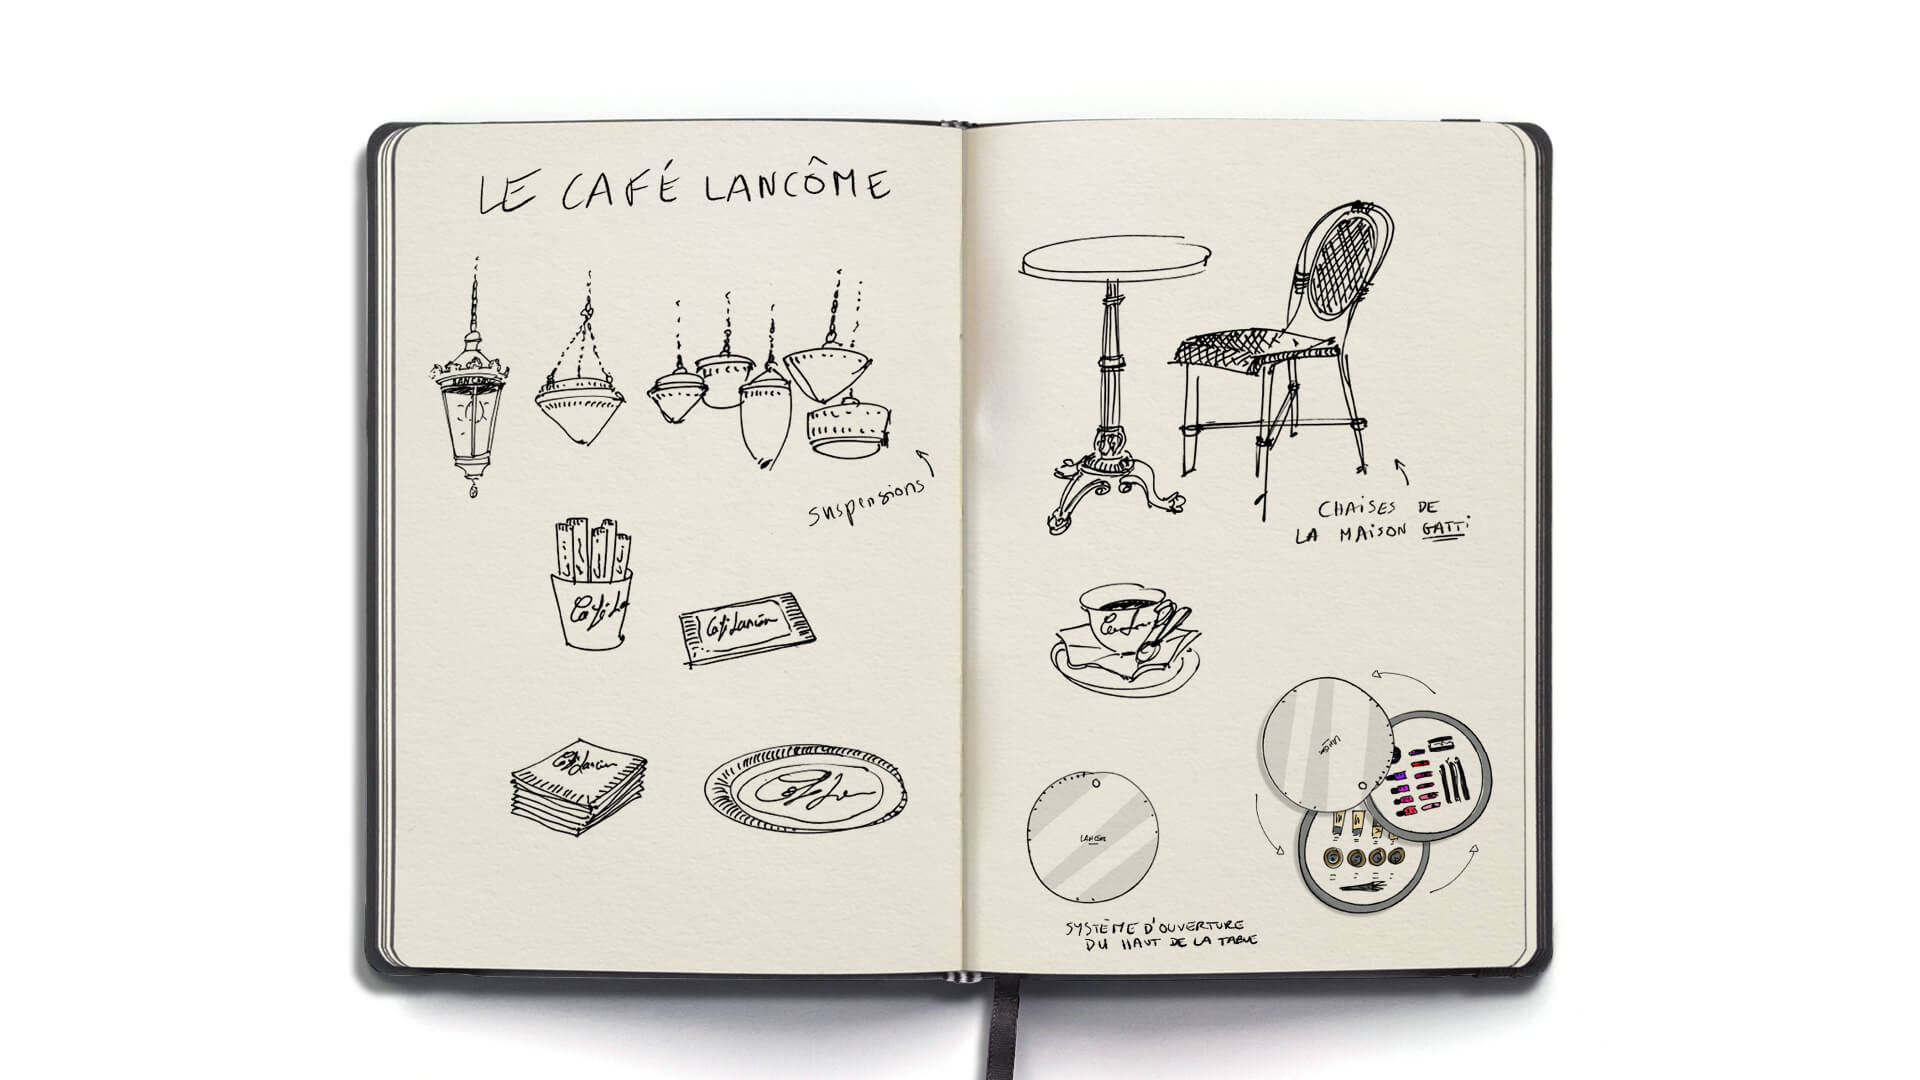 Podium Cafe Lancome Sephora 3